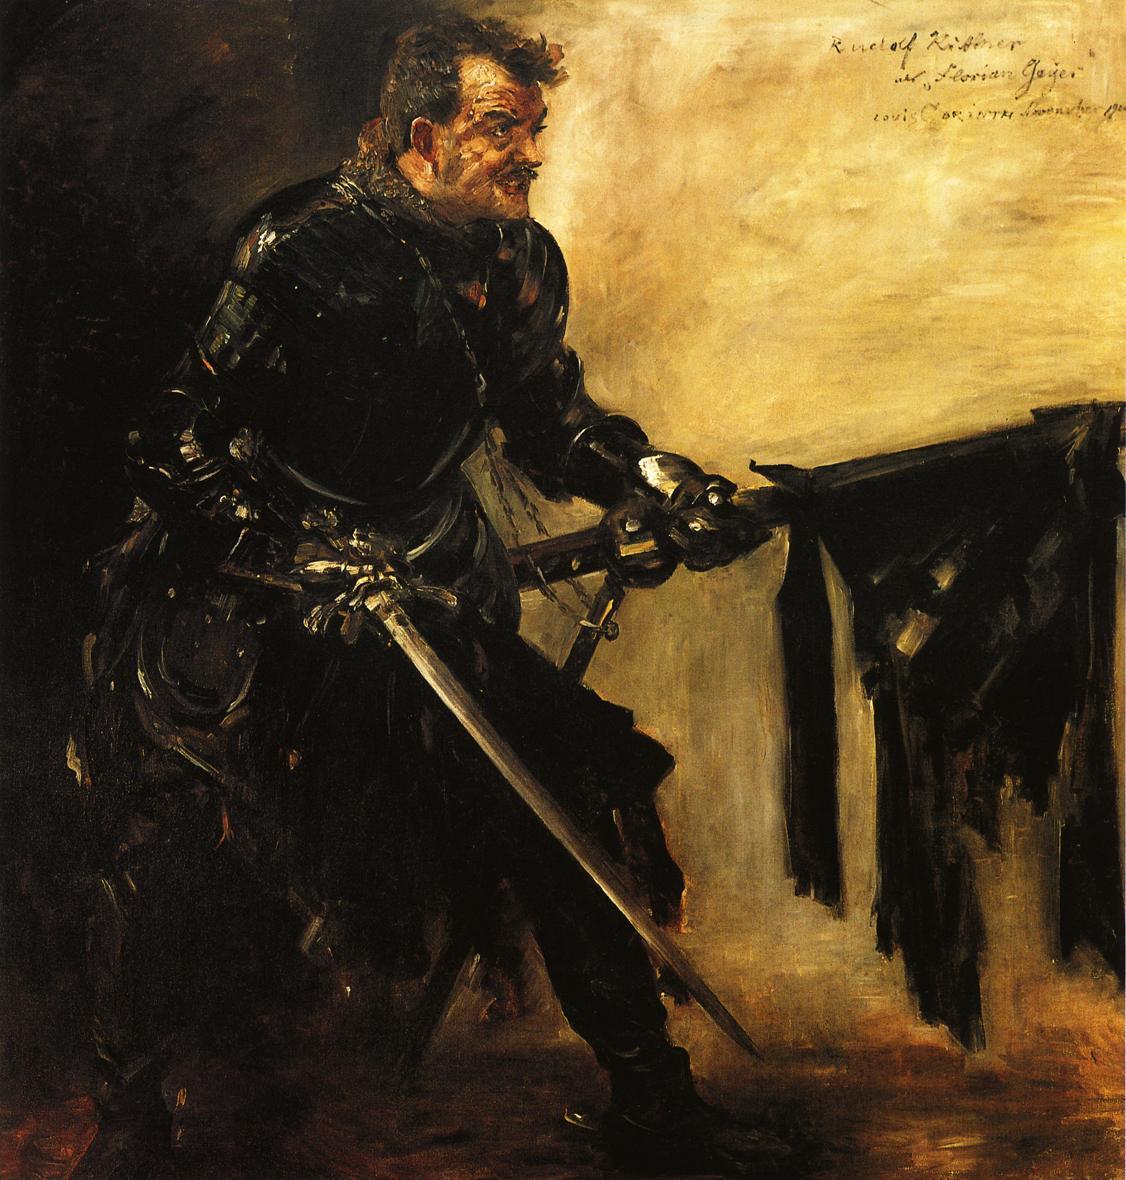 Rudolph Rittner as Florian Geyer First Version | Lovis Corinth | oil painting